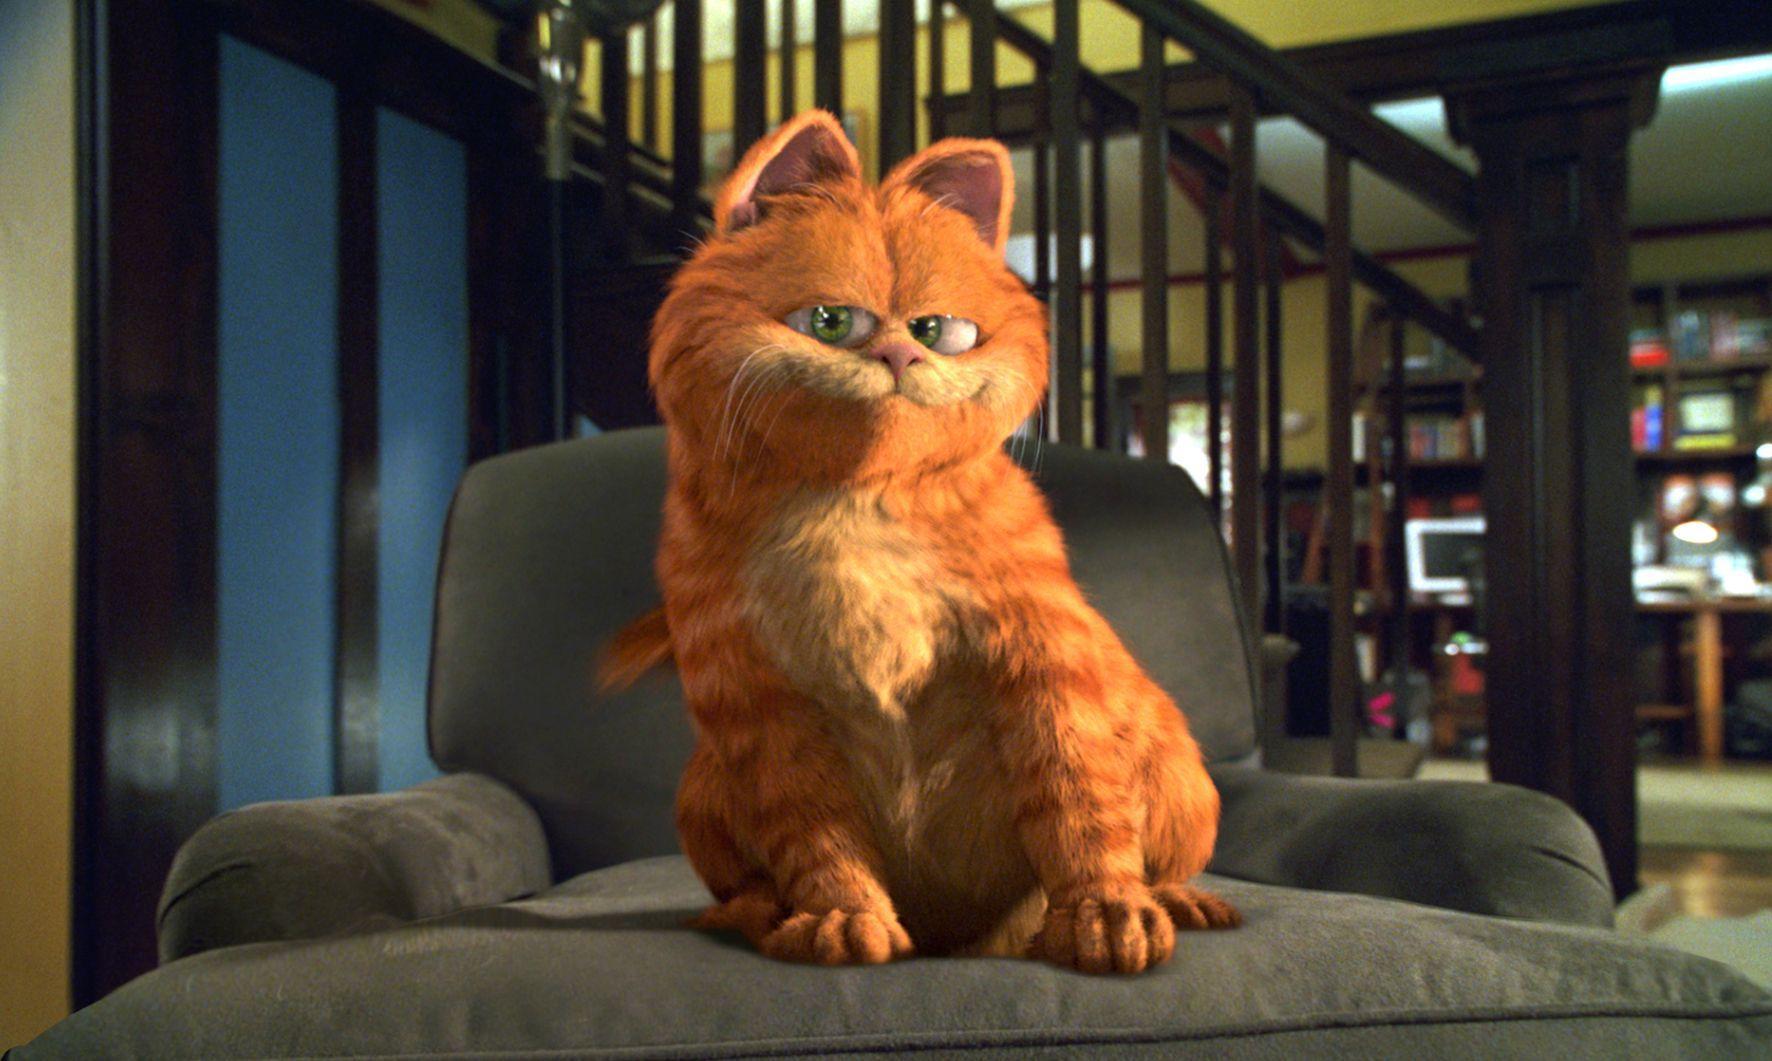 Garfield Movie Wallpapers - Wallpaper Cave